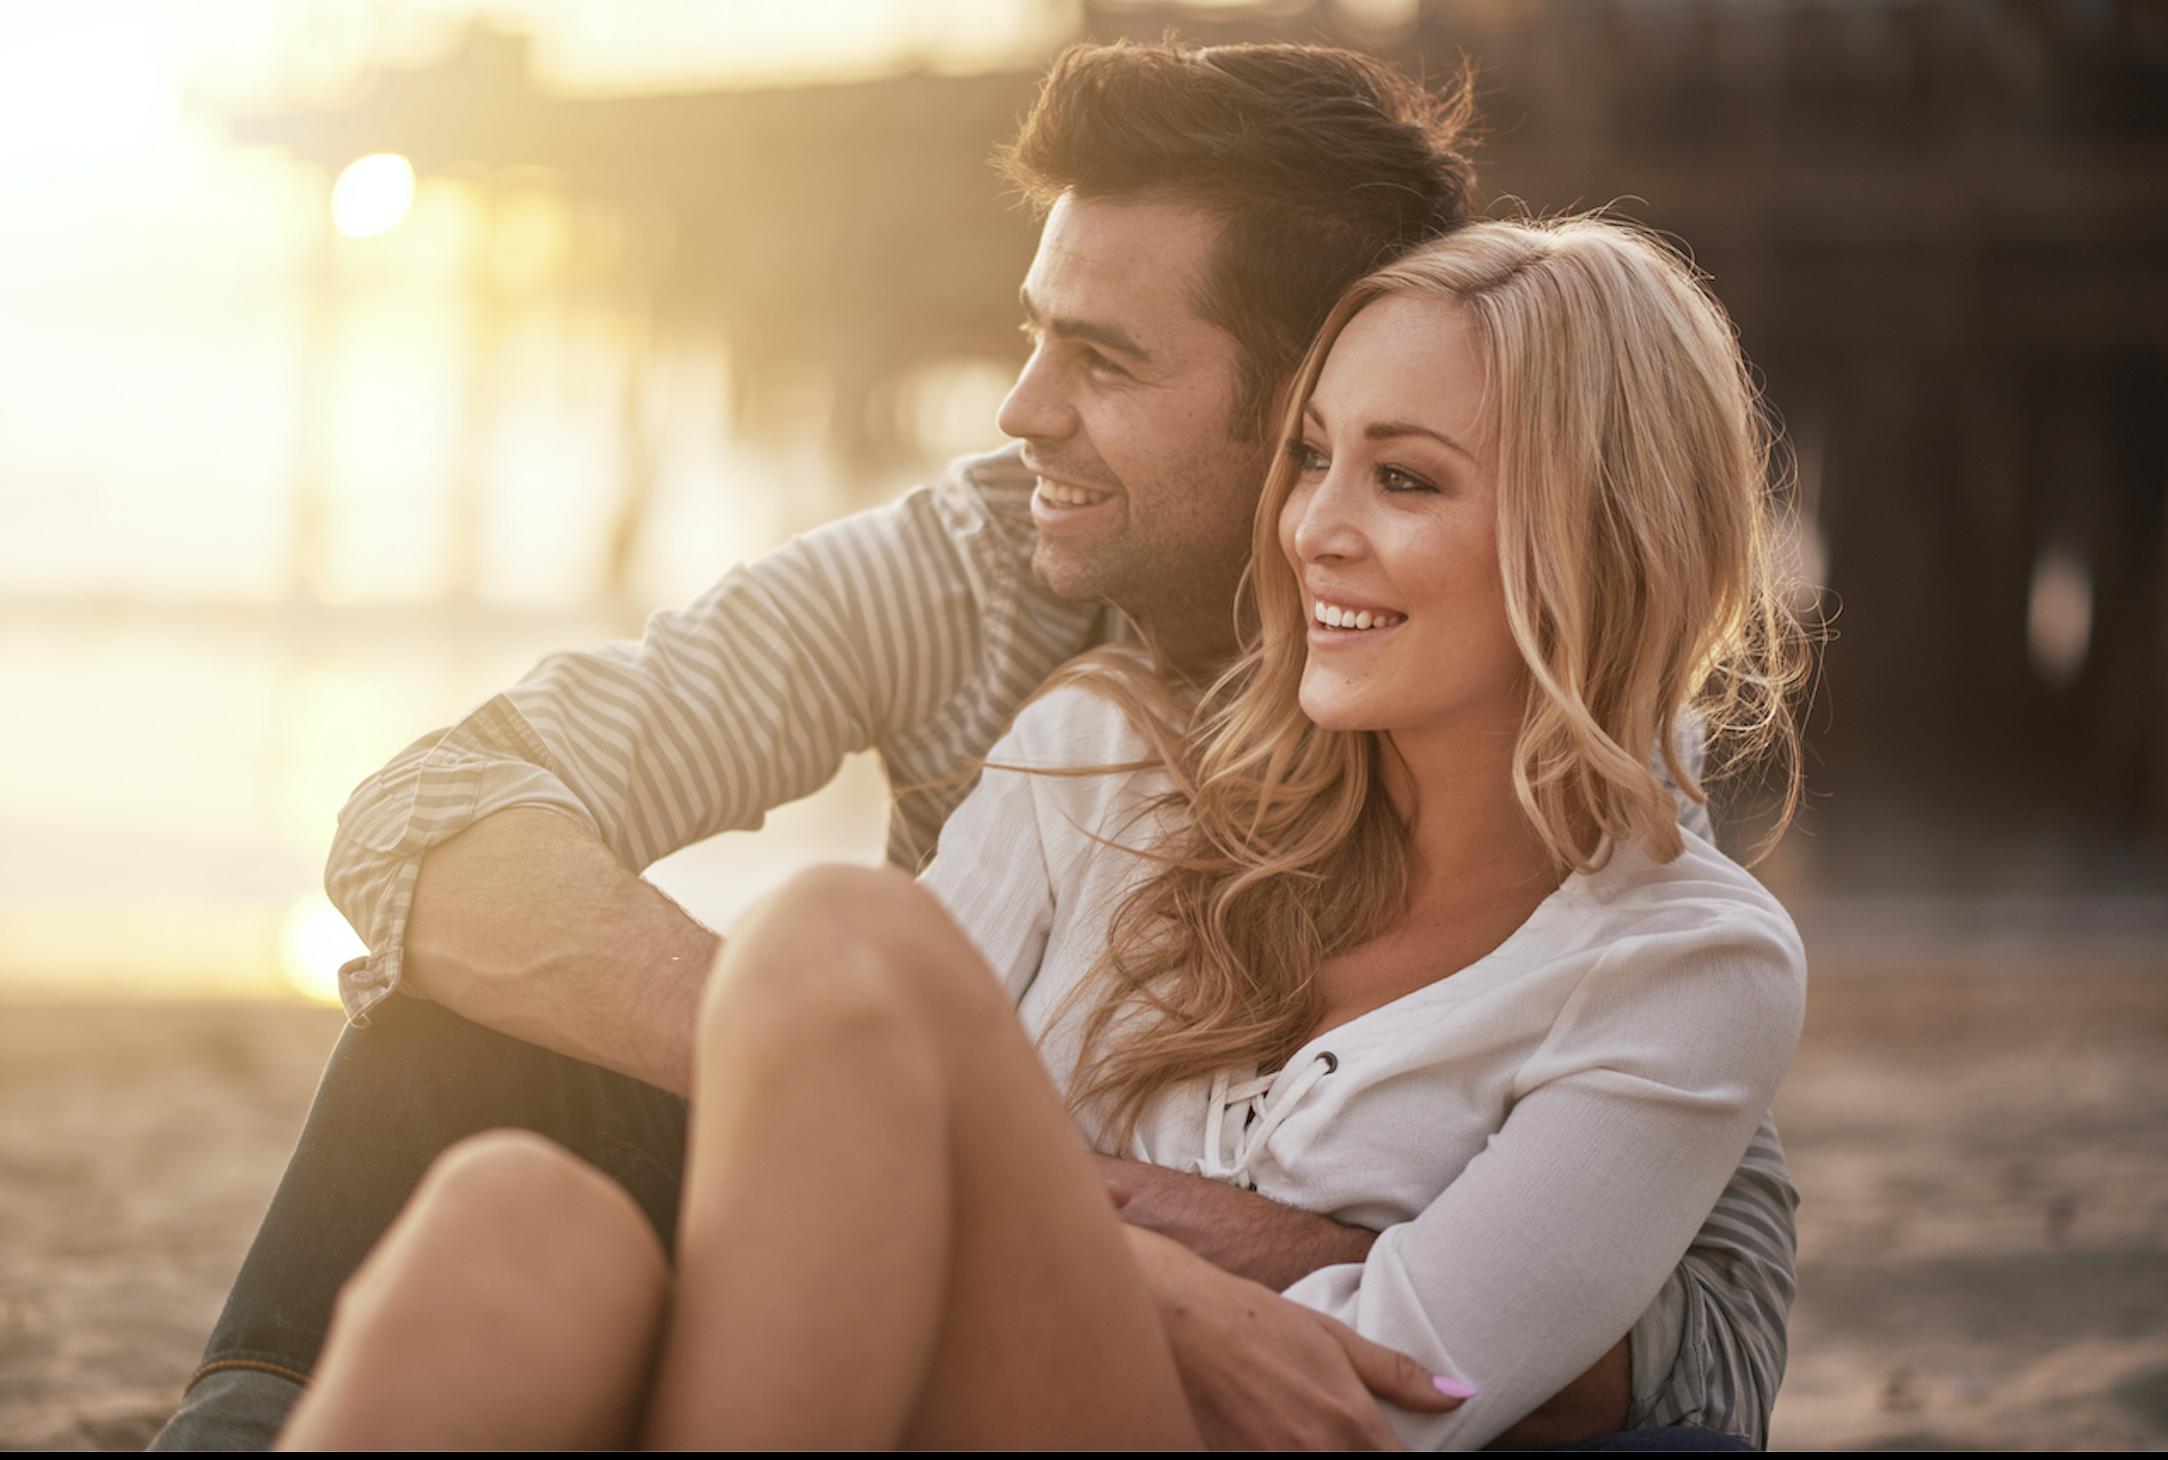 Couple struggling with infertility taking IntimacyIVF masterclass